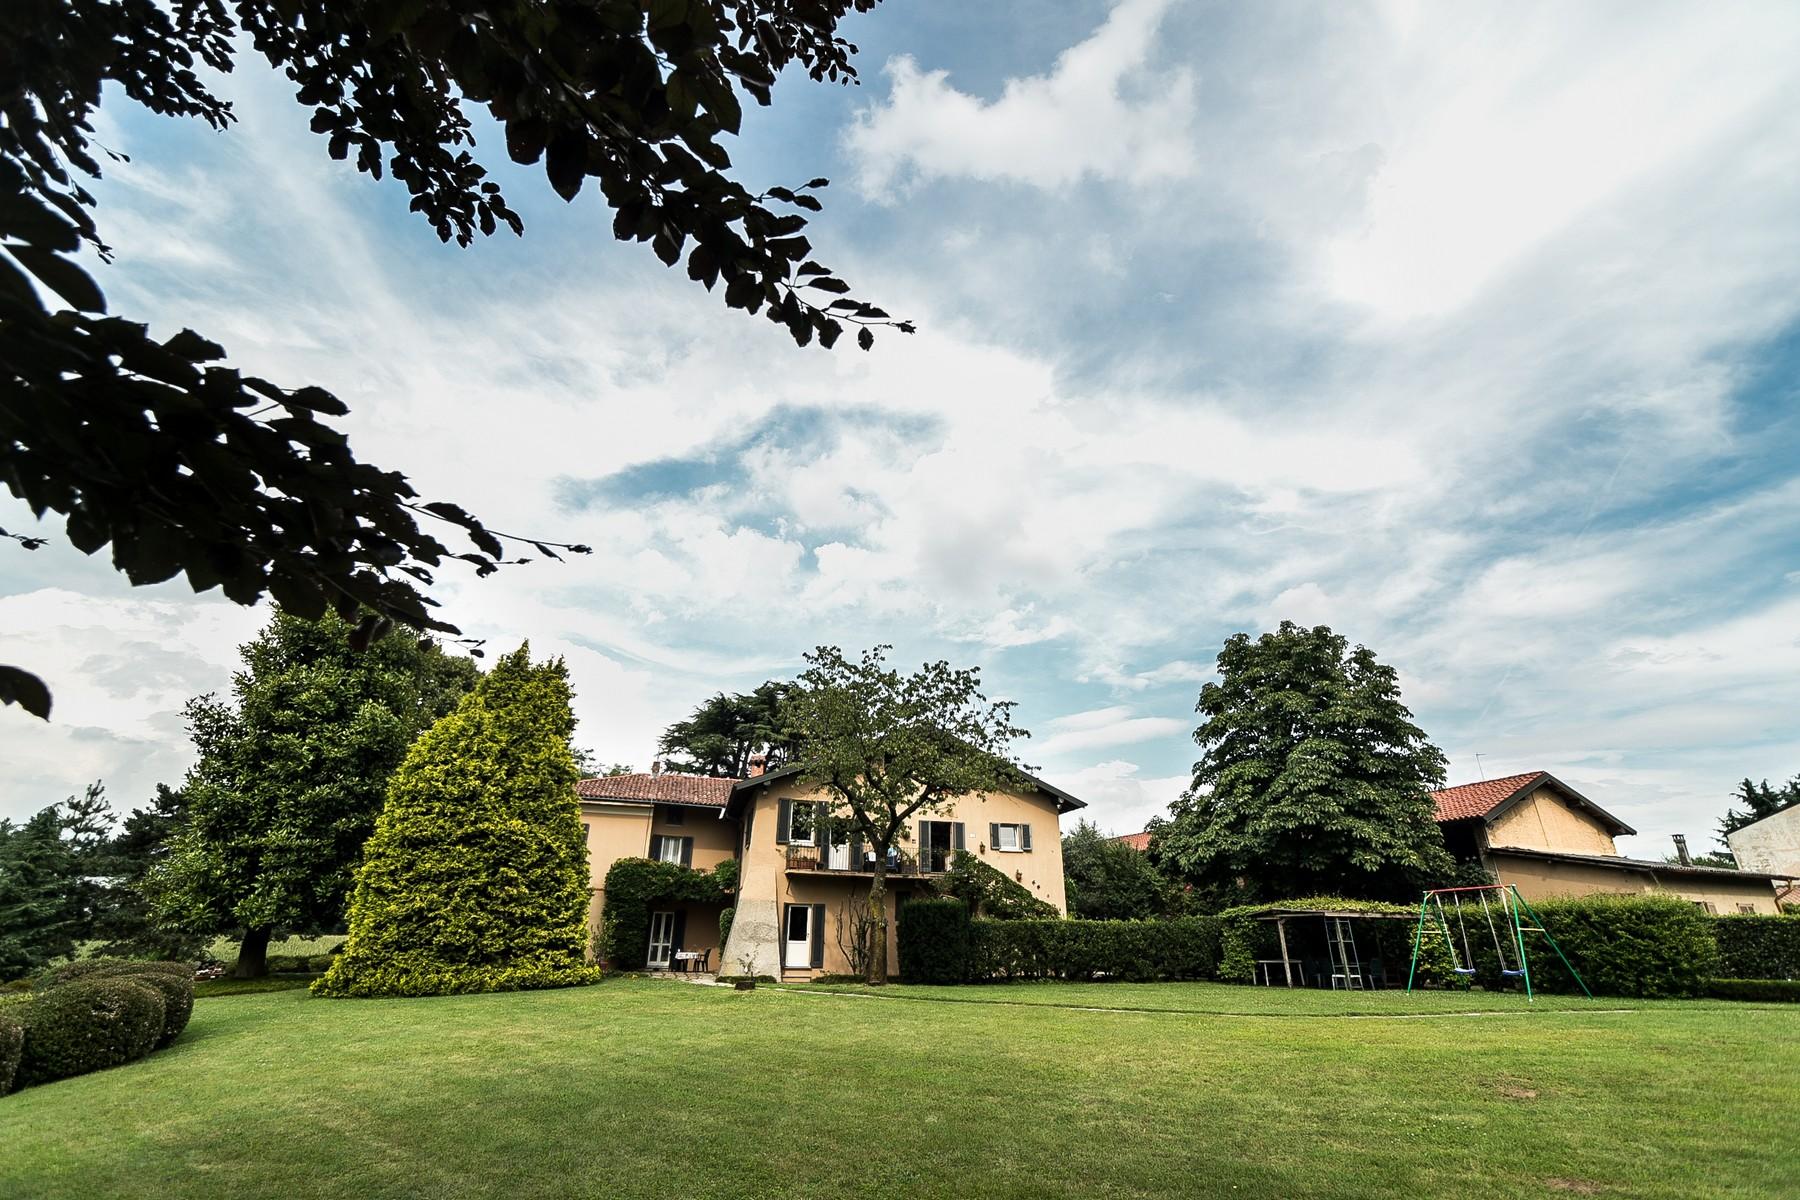 Villa in Vendita a Carimate: 5 locali, 800 mq - Foto 4